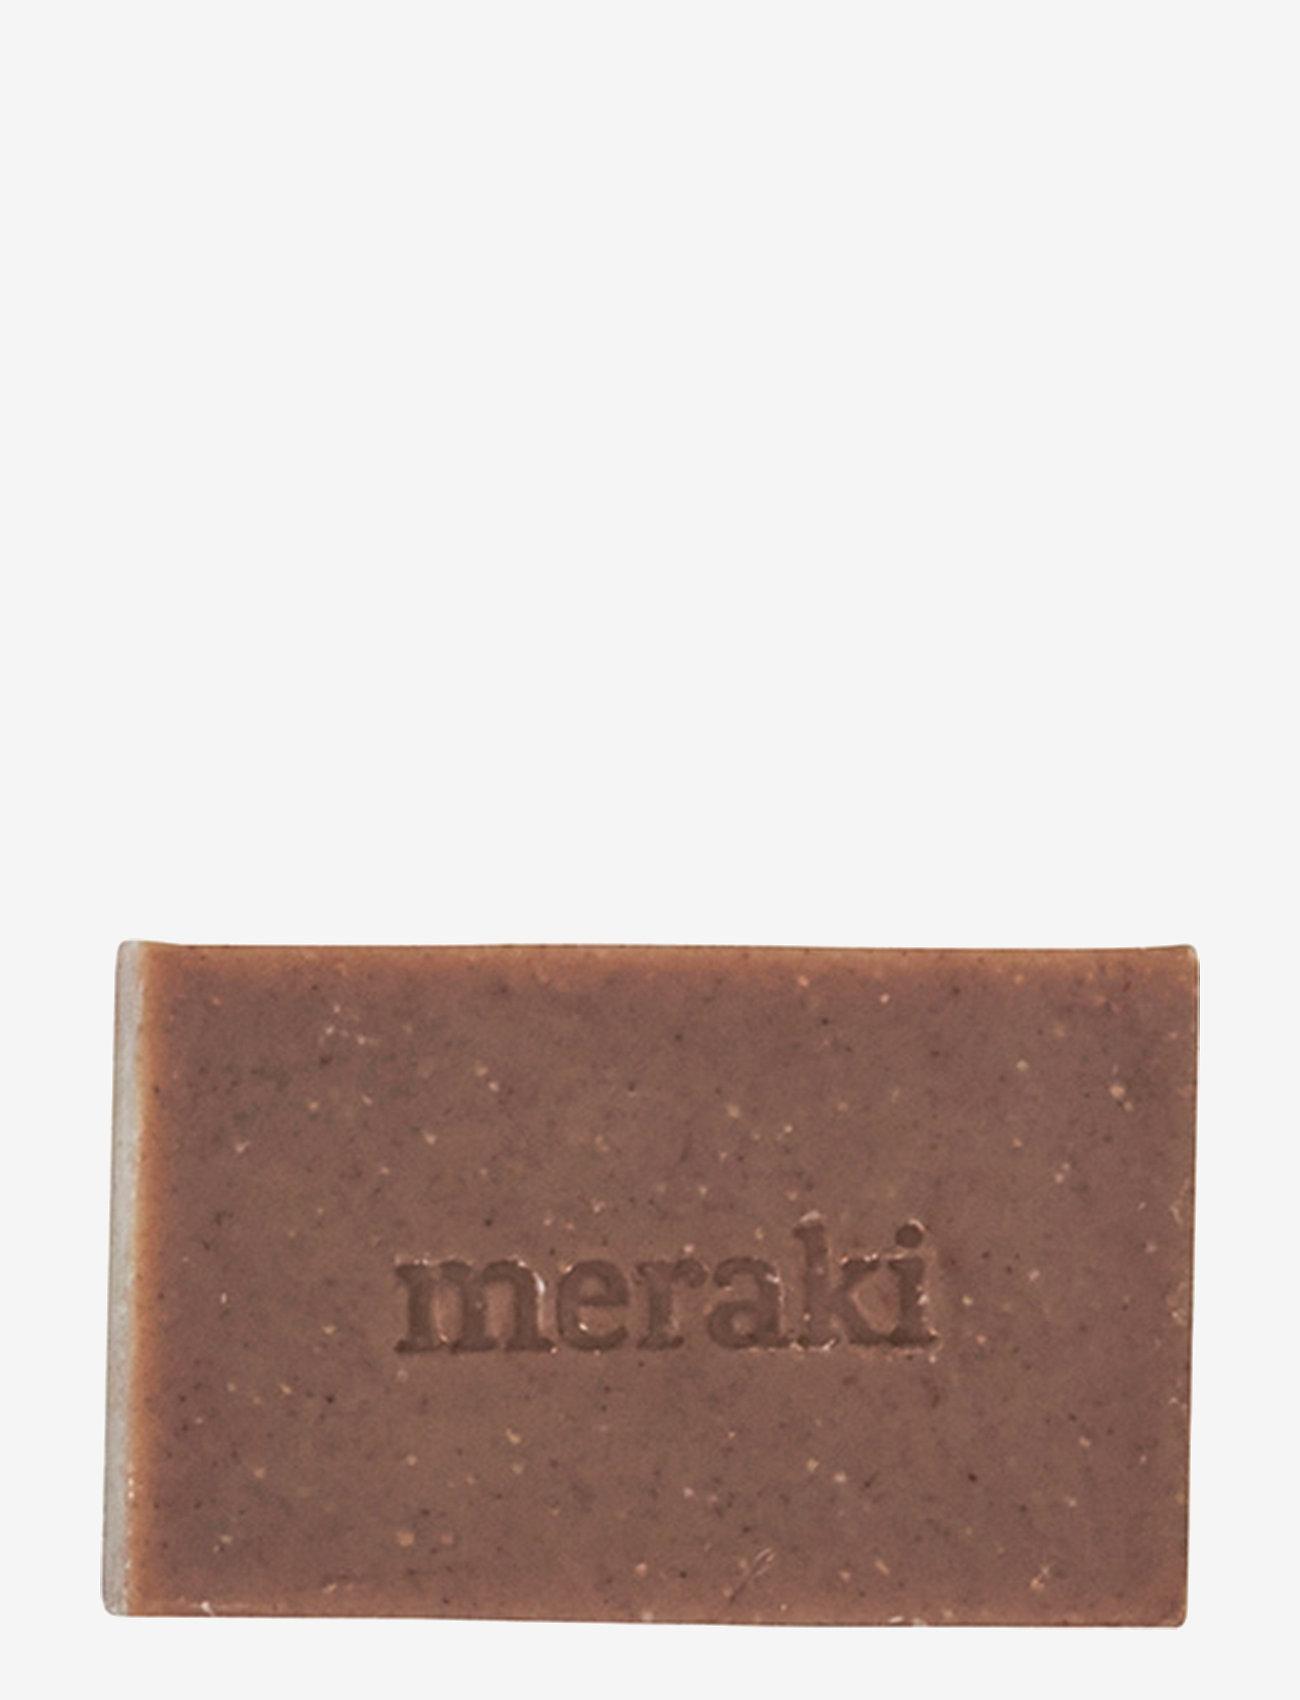 meraki - Hand soap, Mangostone - handtvål - no coluor - 0